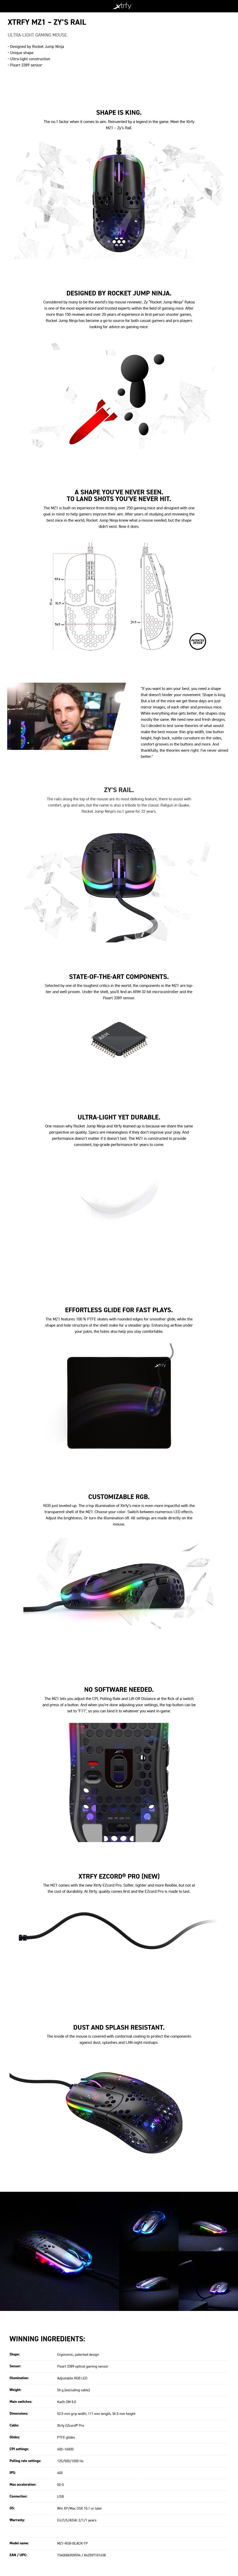 Xtrfy MZ1 - Zy's Rail - RGB Optical Gaming Mouse - Black - Desktop Overview 1